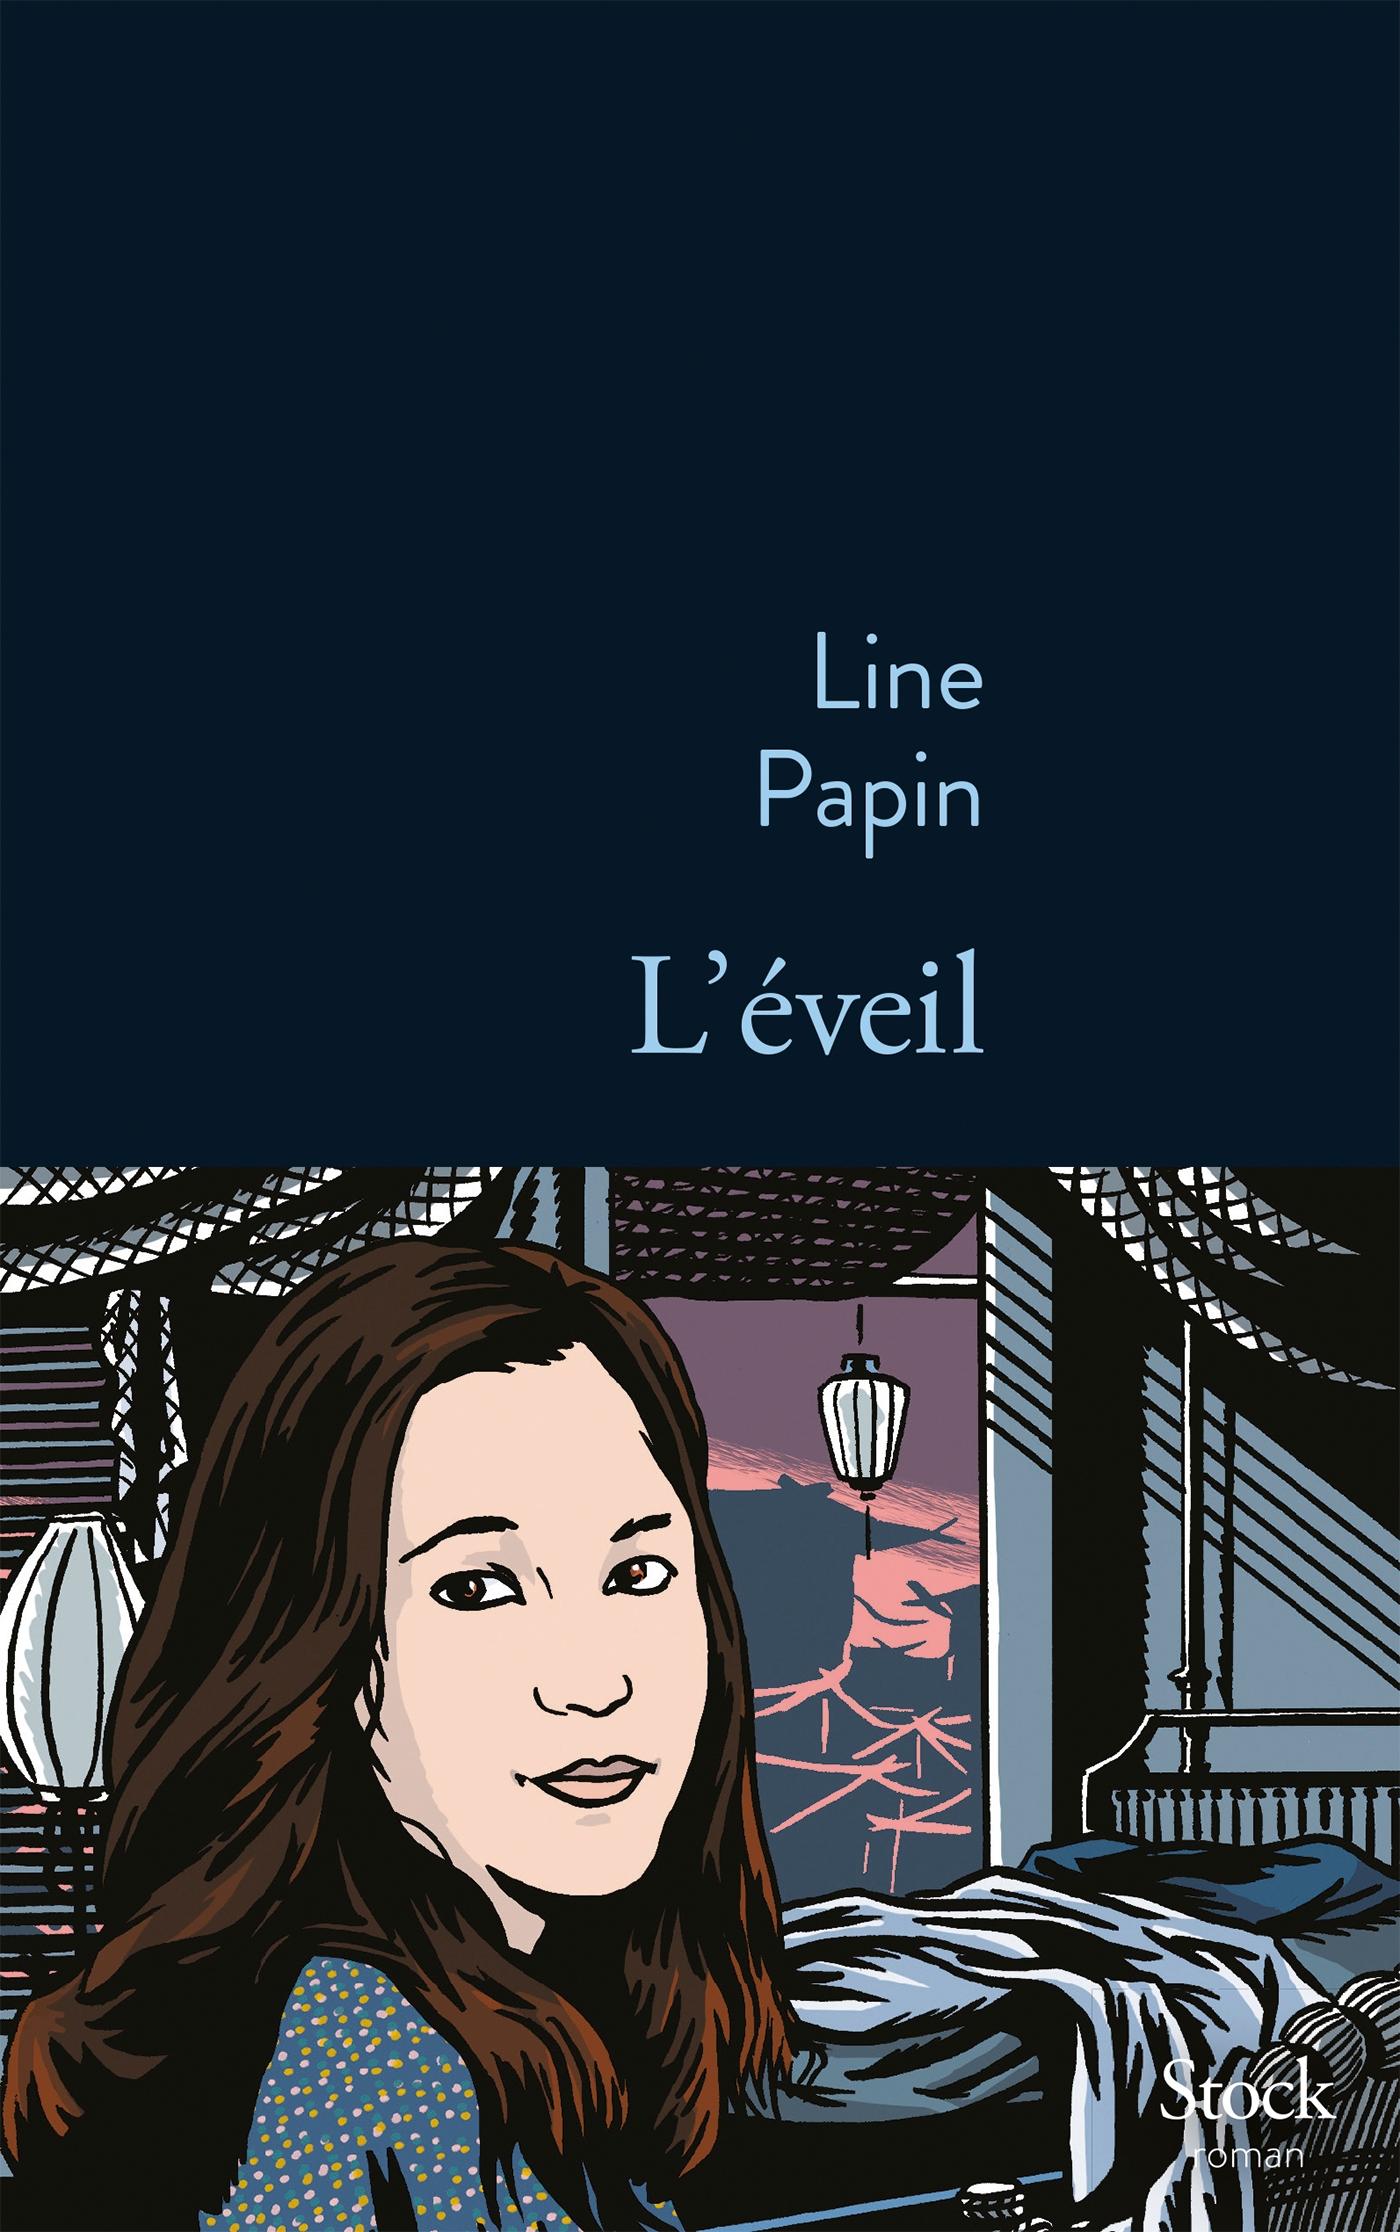 L'éveil - Line Papin - Editions Stock